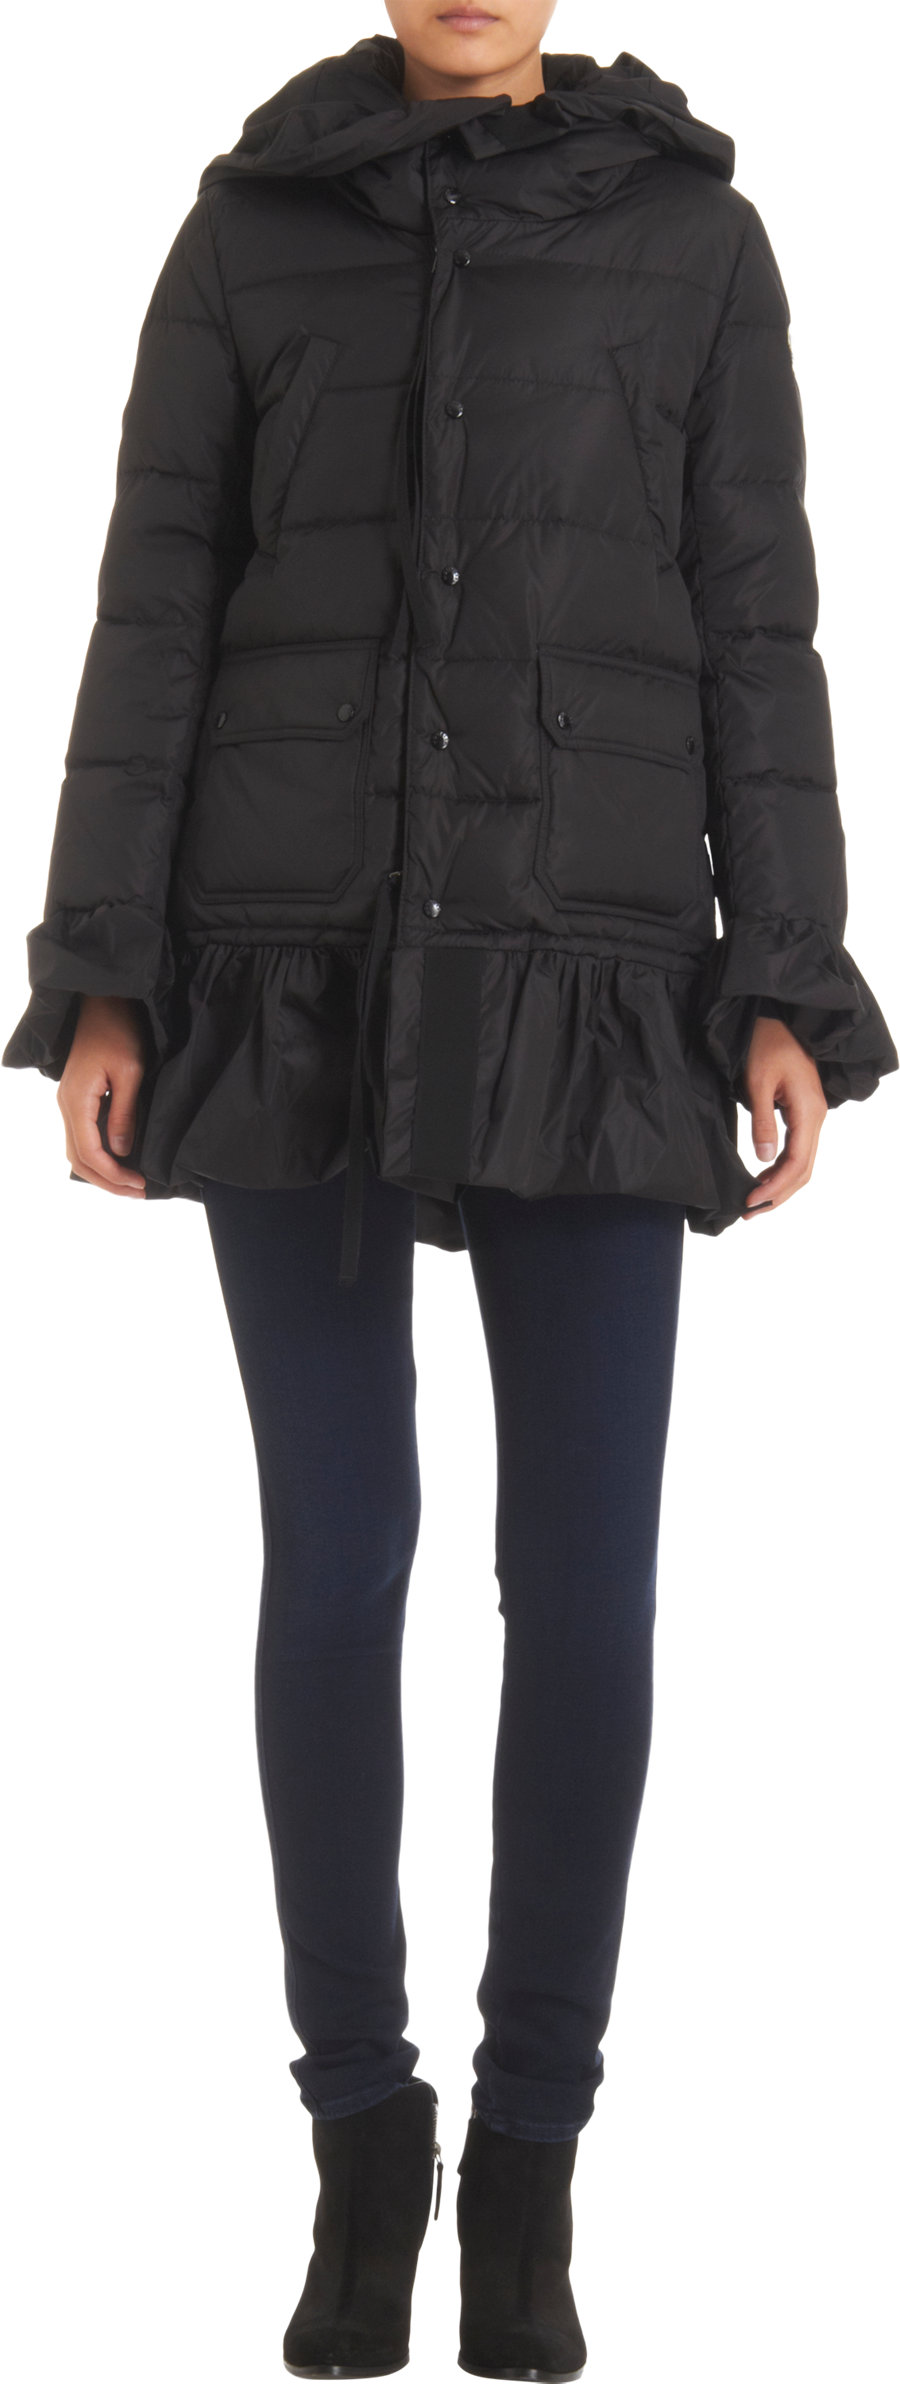 17b45bbec shopping moncler jacket ruffles and lace 24ed9 abf02